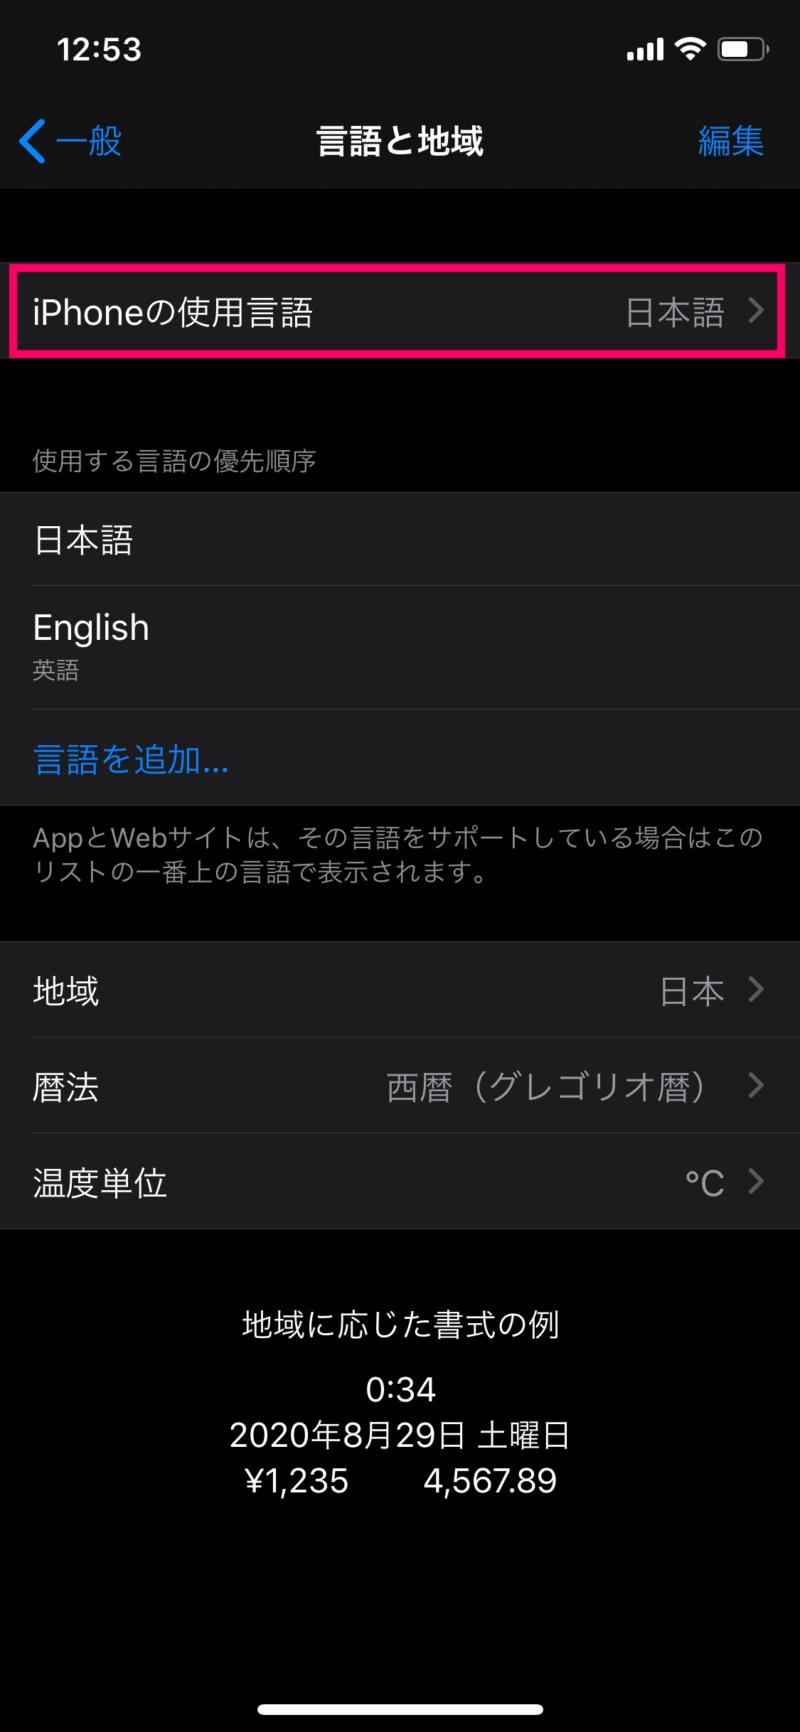 iPhoneの言語設定を英語に変える方法3